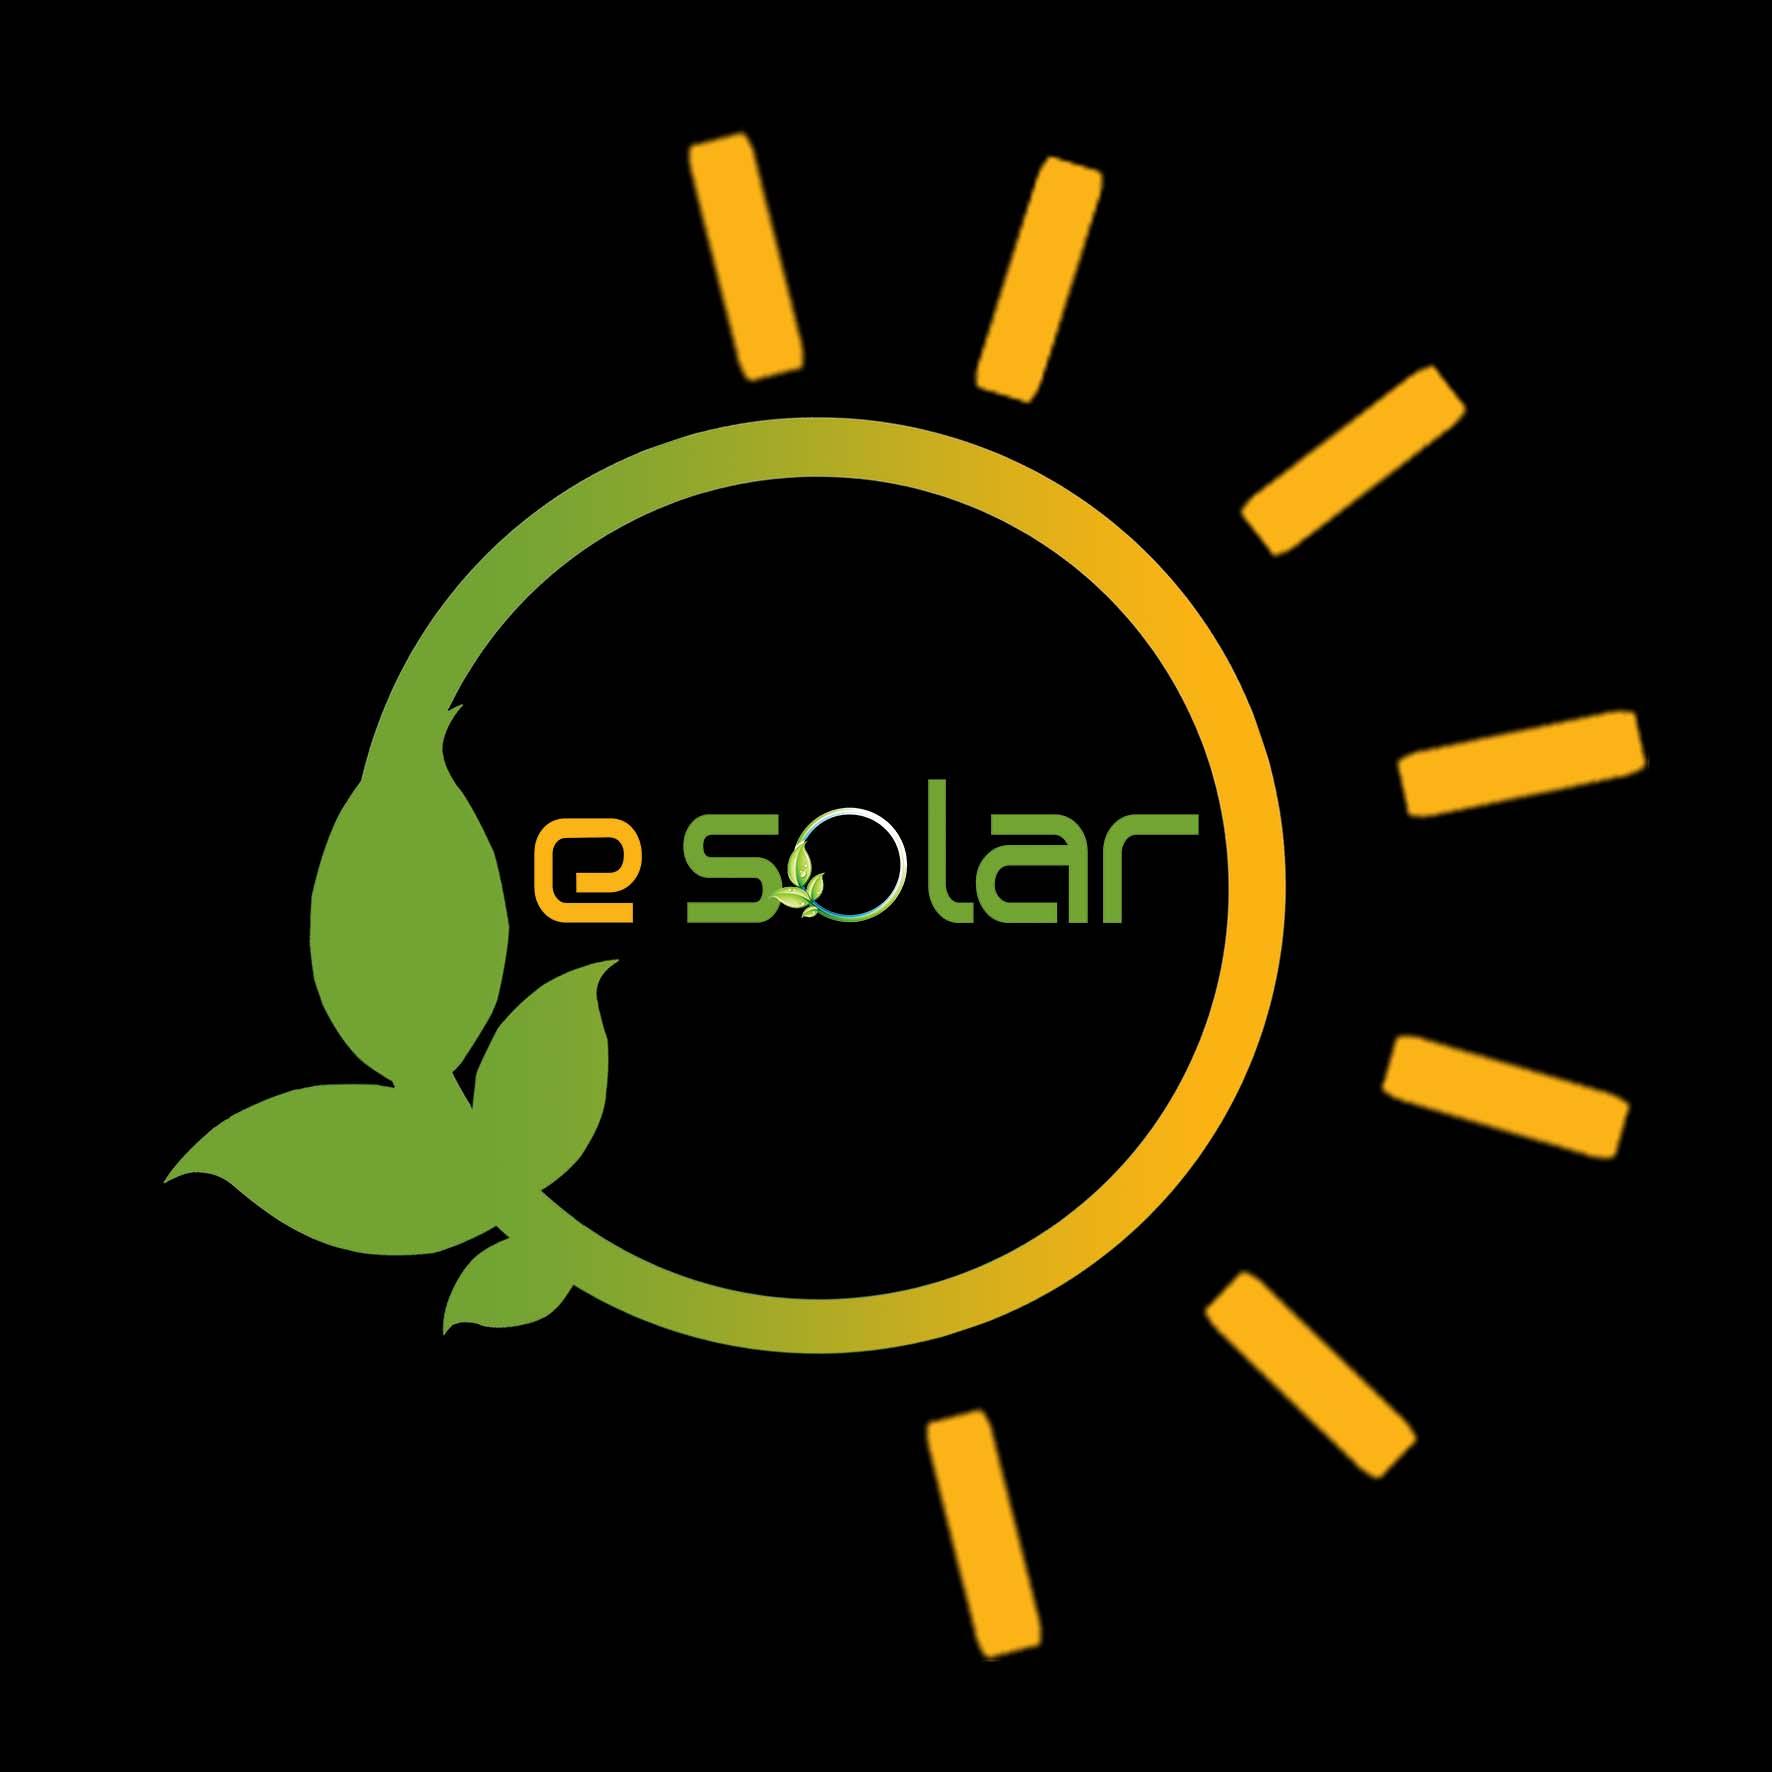 Esolar for Renewable Energy